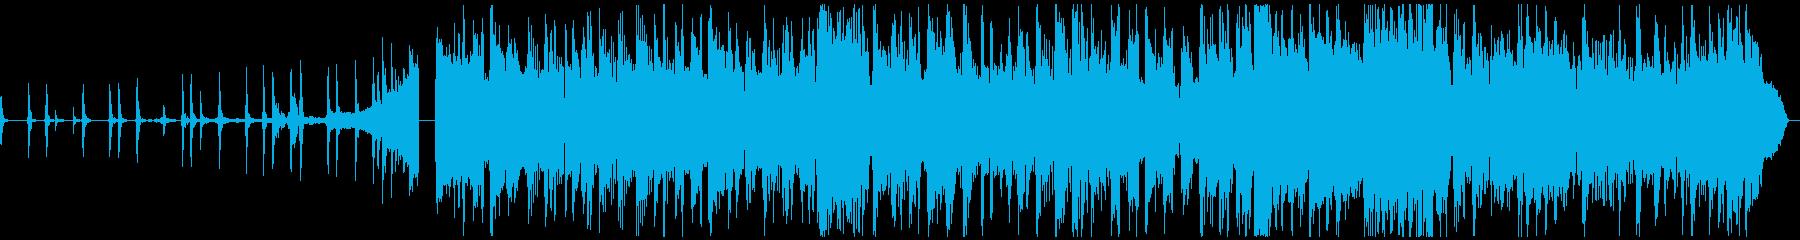 CM用!30秒で完結するポストロック曲の再生済みの波形